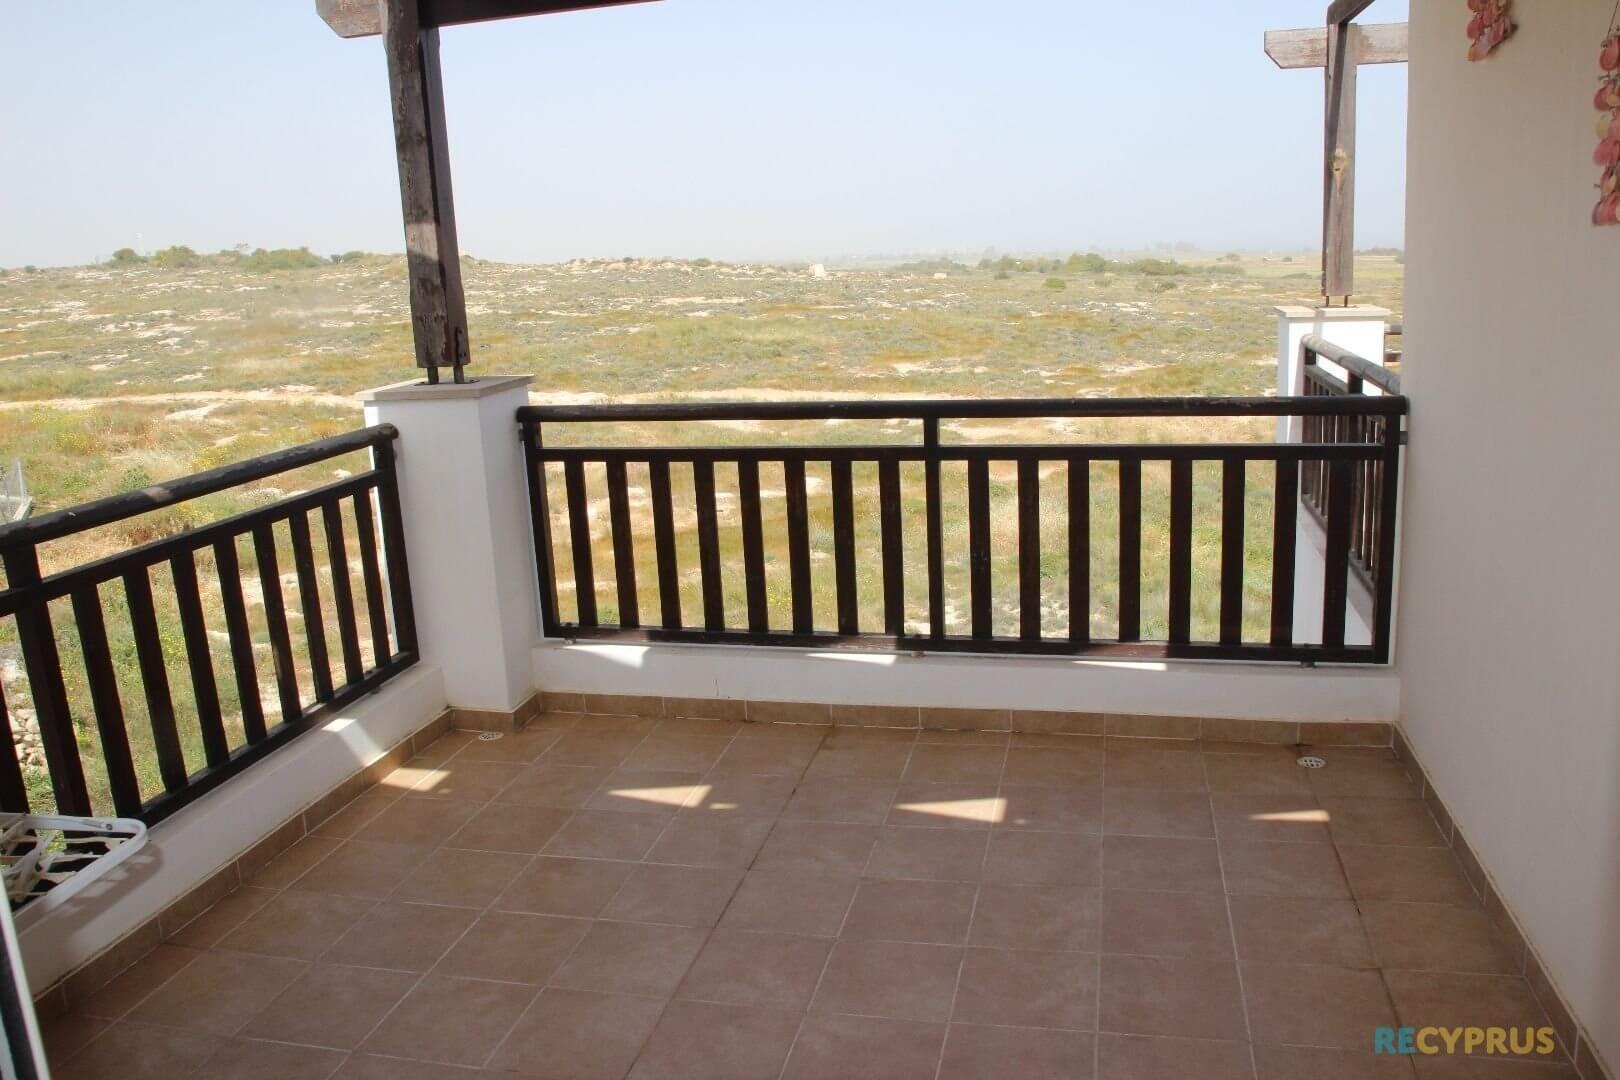 Apartment for sale Kapparis Famagusta Cyprus 8 3560